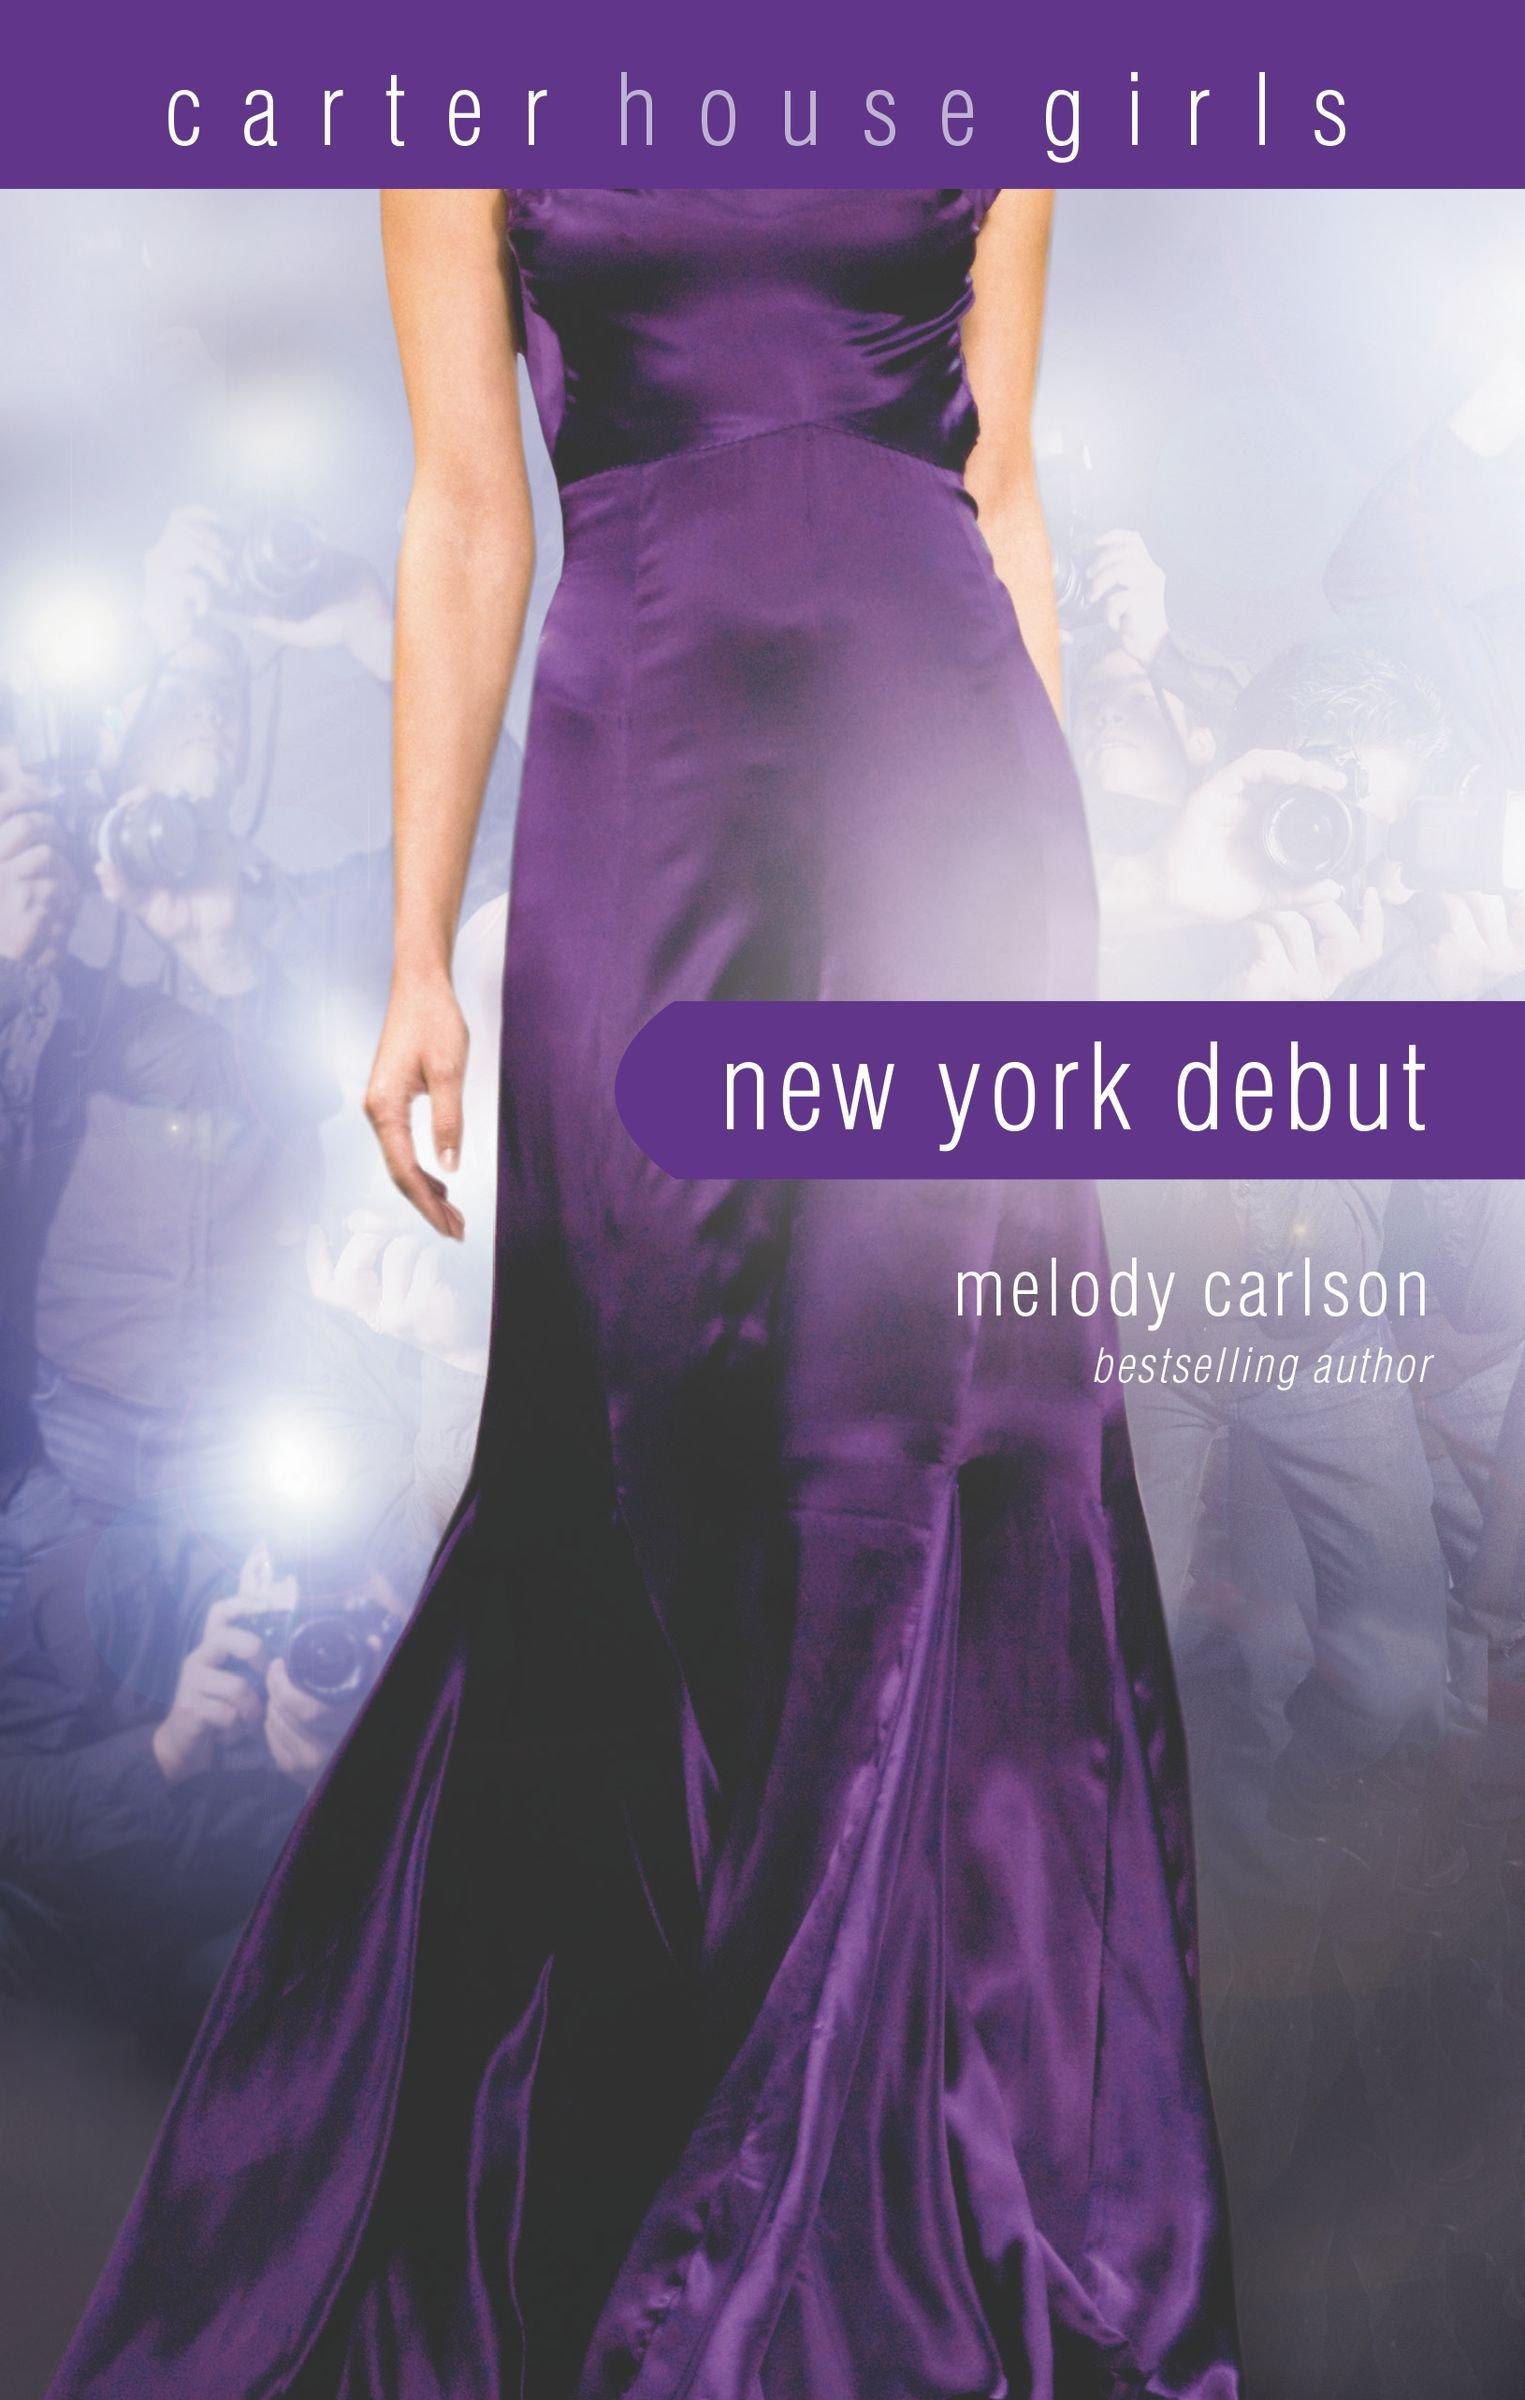 New York Debut (Carter House Girls)